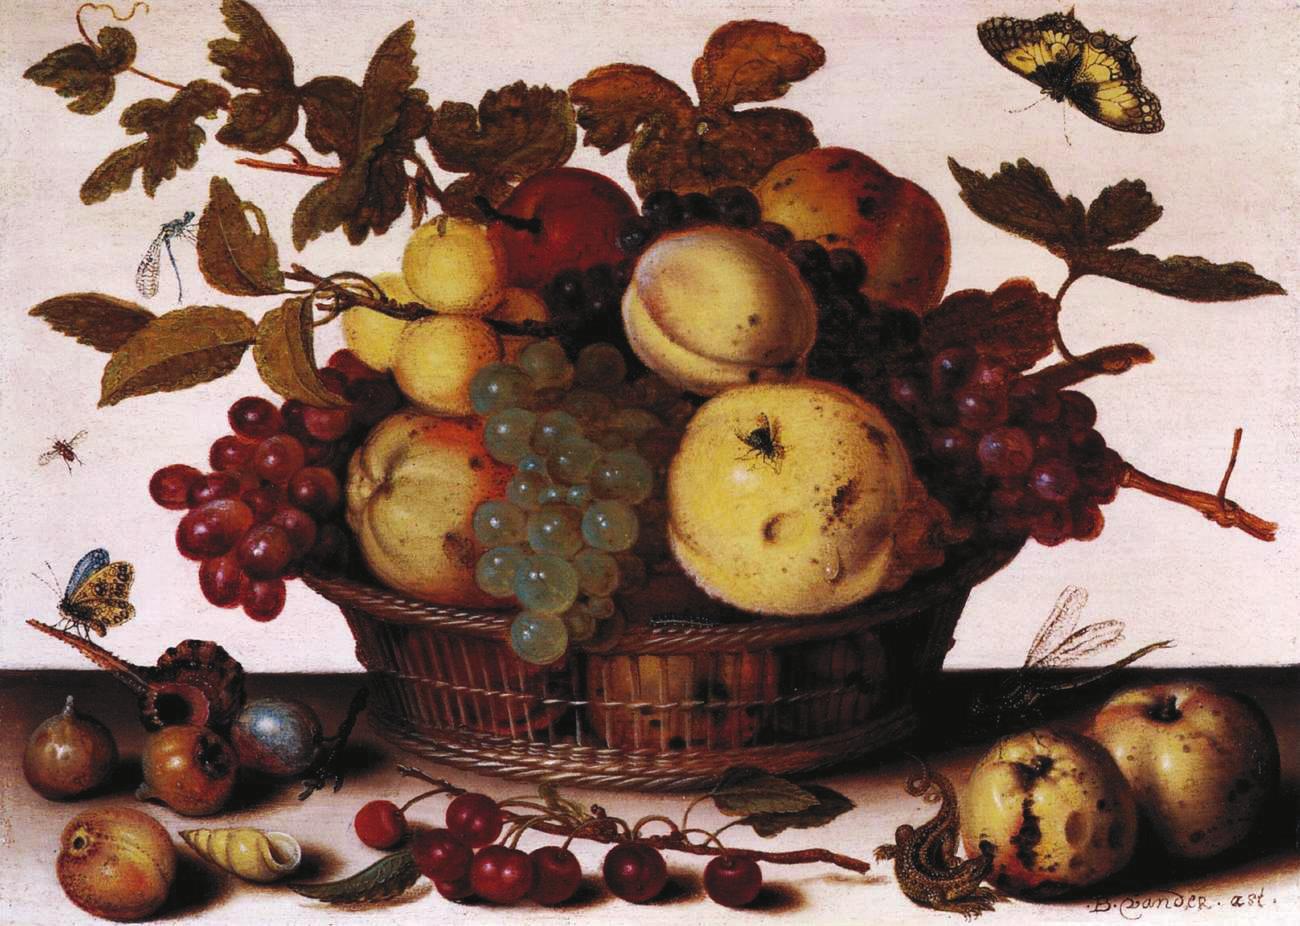 Балтазар ван ден Аст (Balthasar van der Ast). Корзина с фруктами. Около 1625